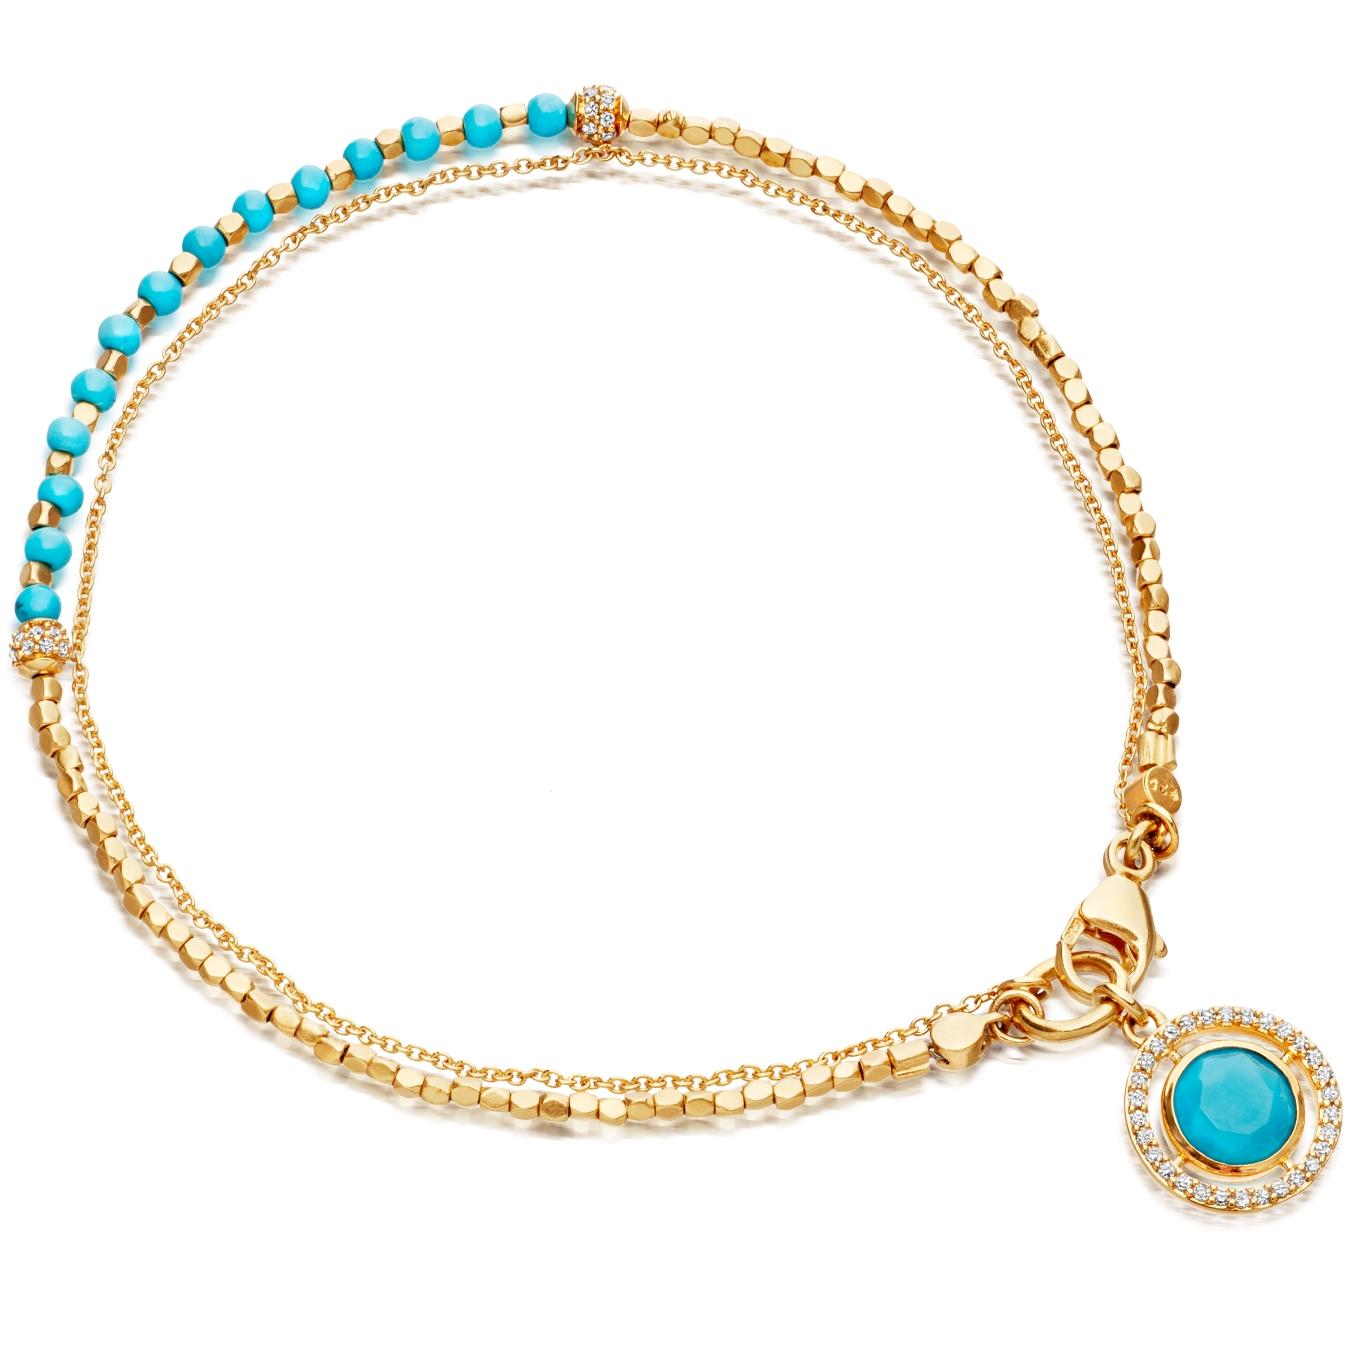 Turquoise Celestial Fine Biography Bracelet